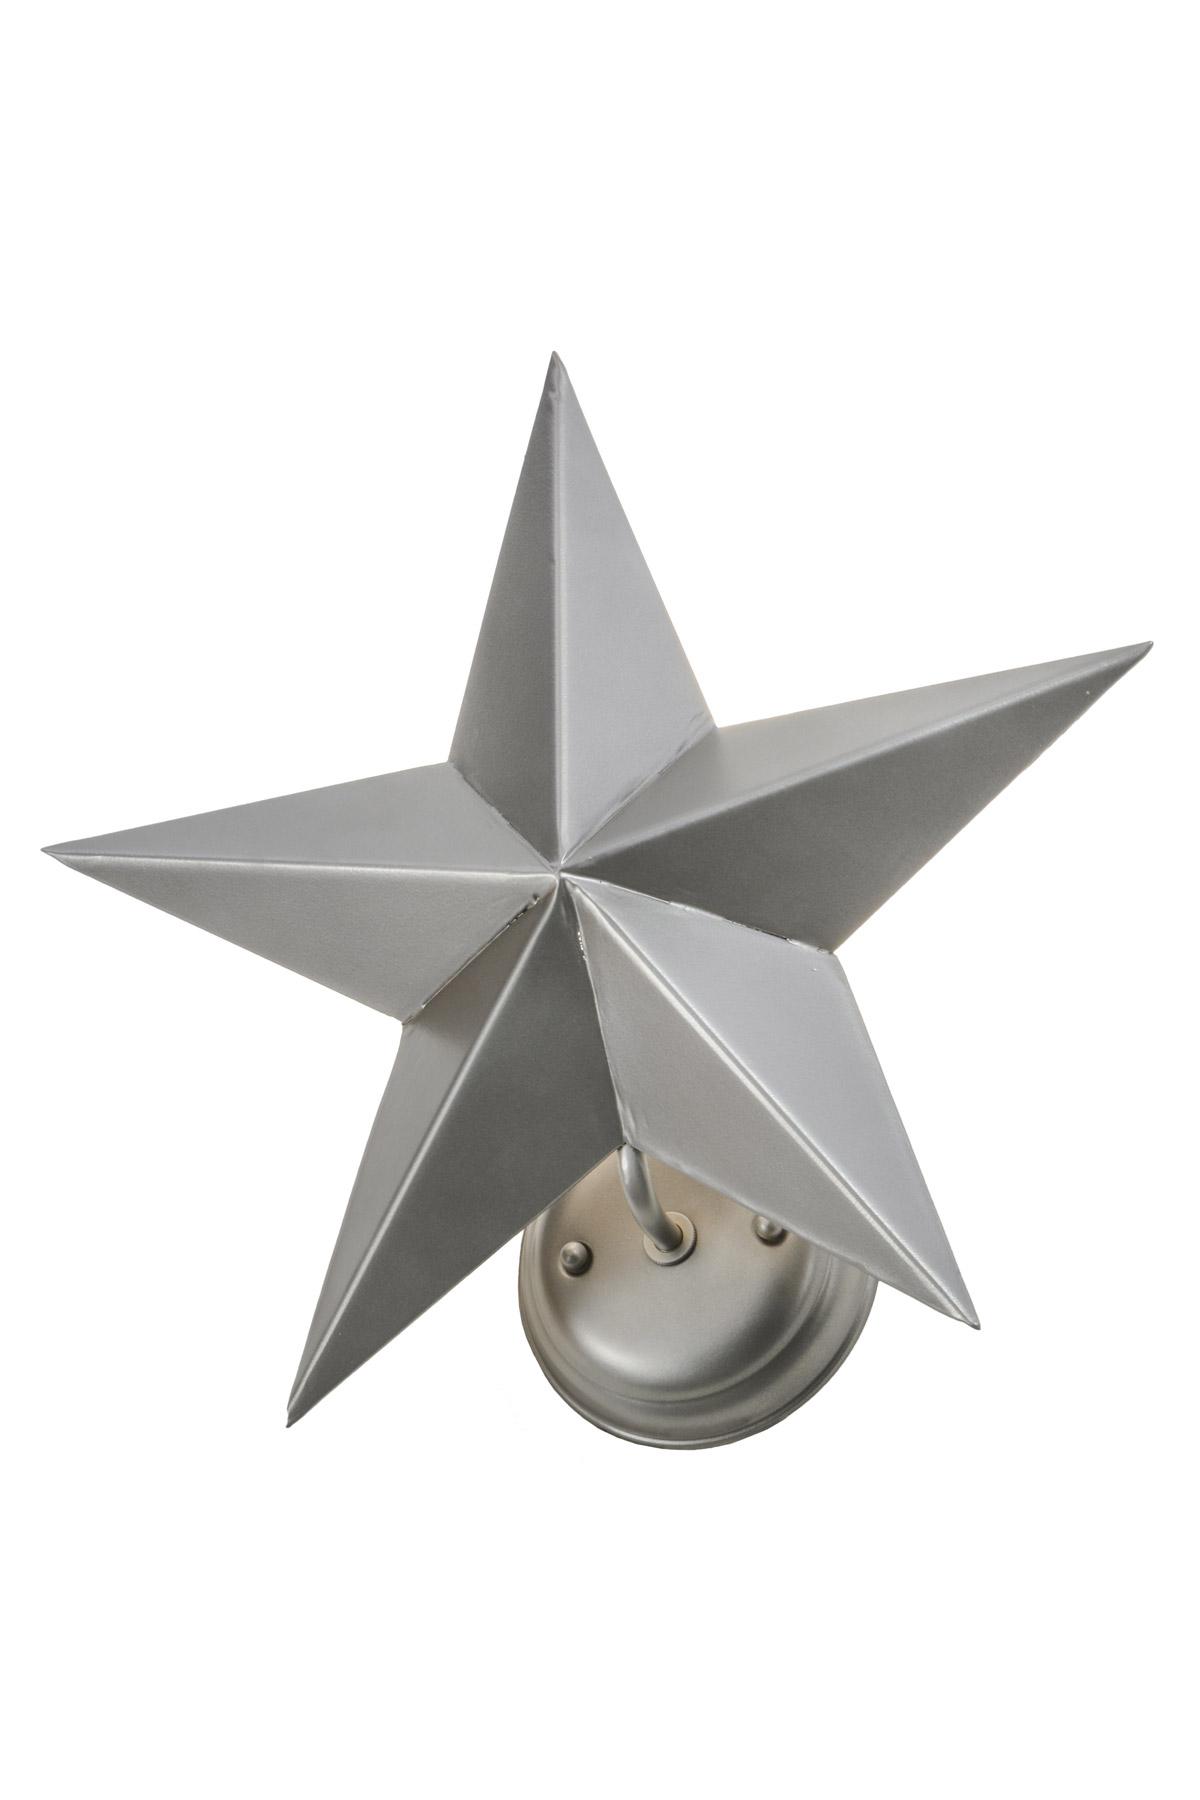 Meyda 152242 Texas Star Wall Sconce